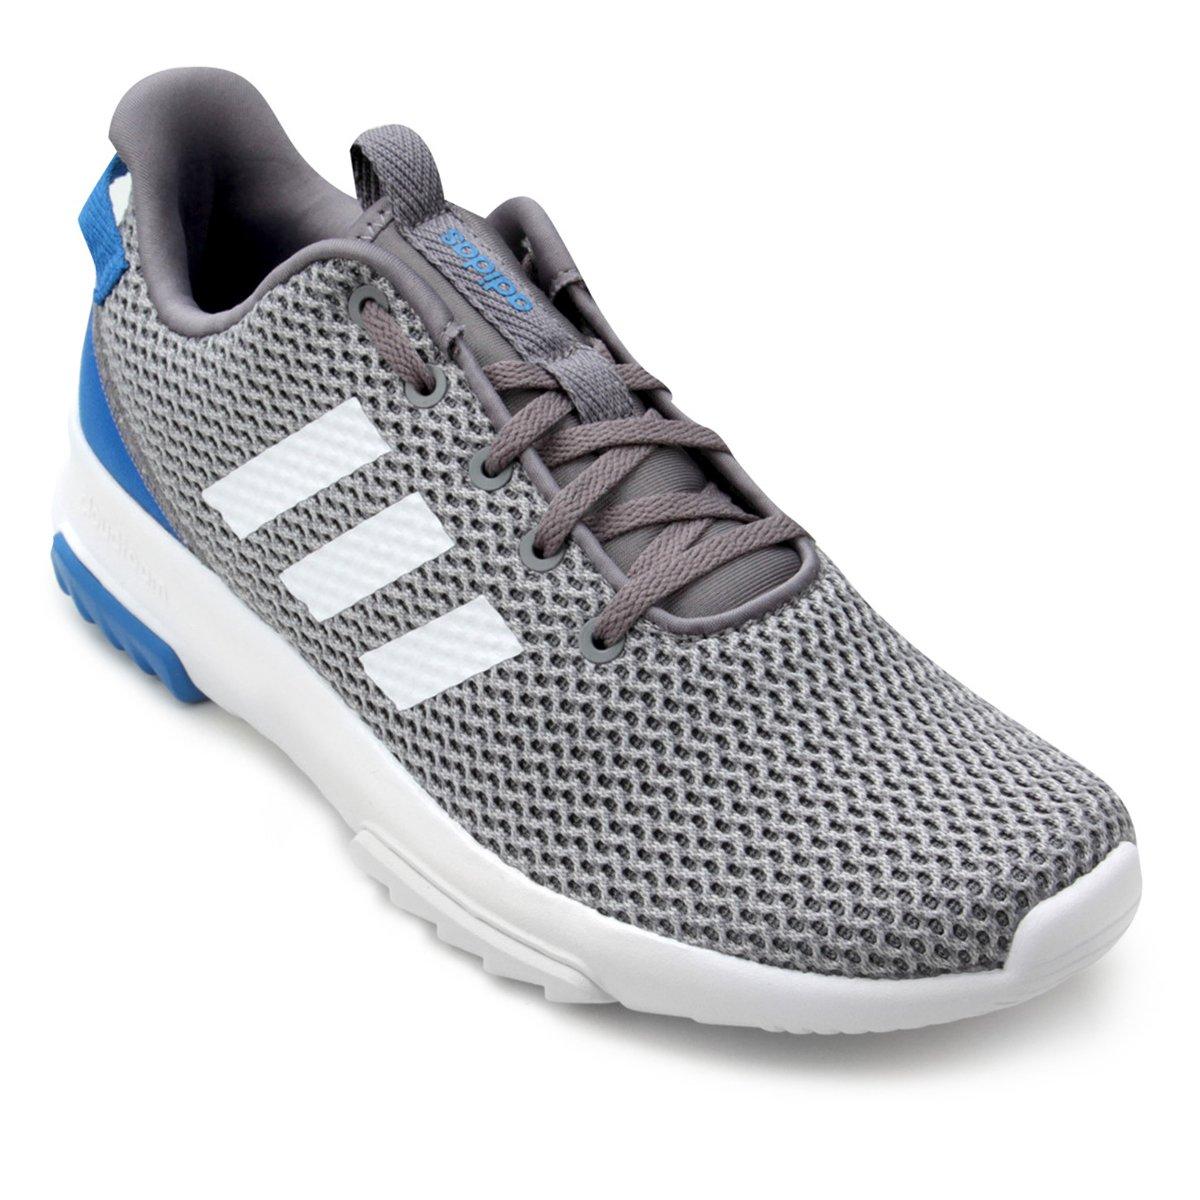 Tênis Adidas Cf Racer Tr Masculino - Cinza e Azul - Compre Agora ... e410ef8527e78